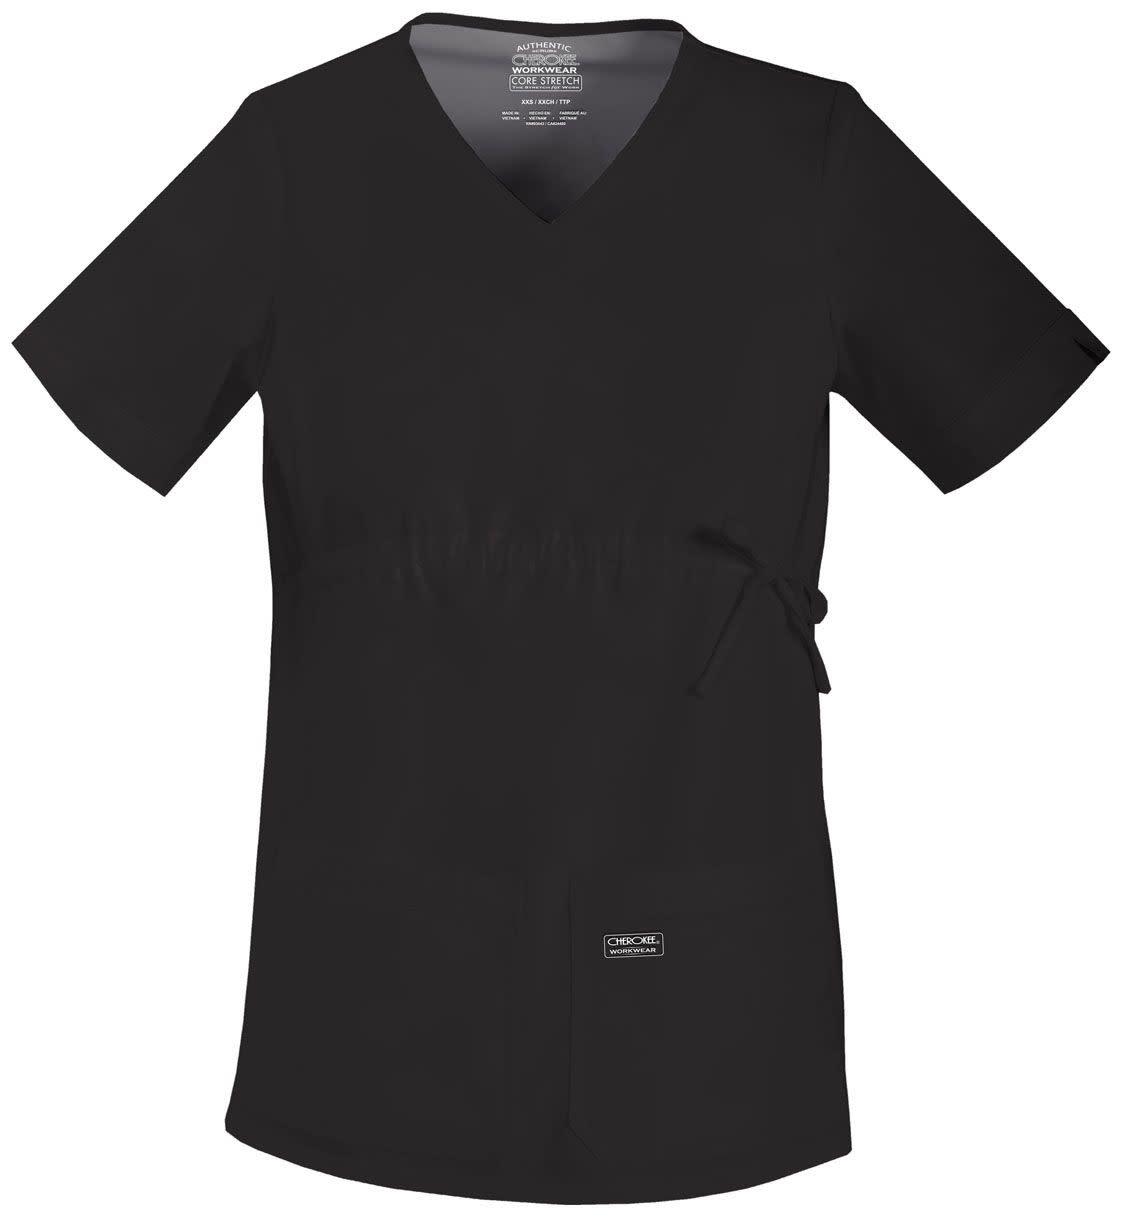 CHEROKEE WORKWEAR Black Cherokee Workwear Maternity Top 4708